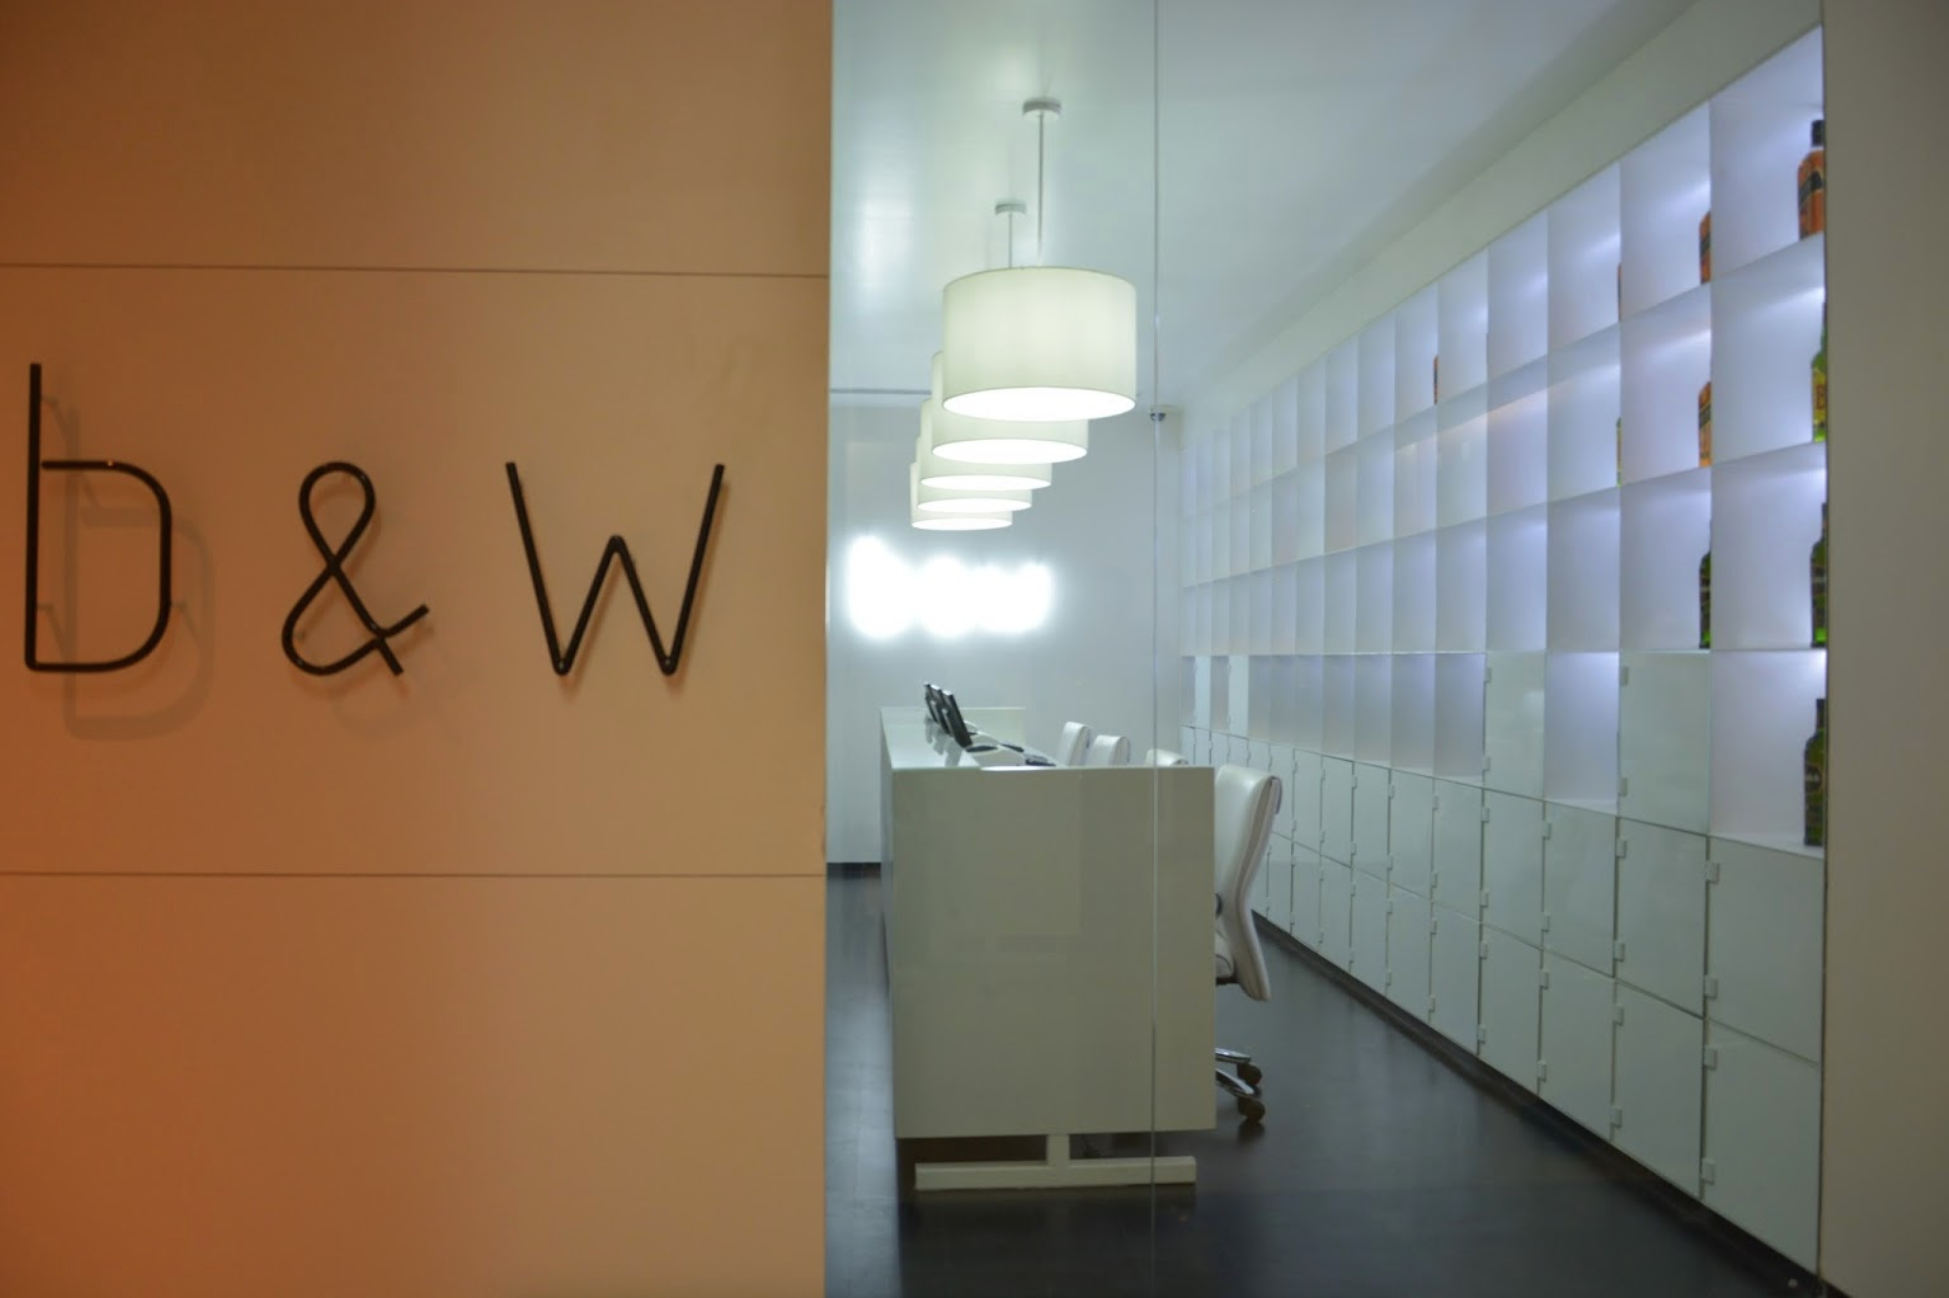 viventium-design-zac-kraemer-b&w-retail-design-10.png